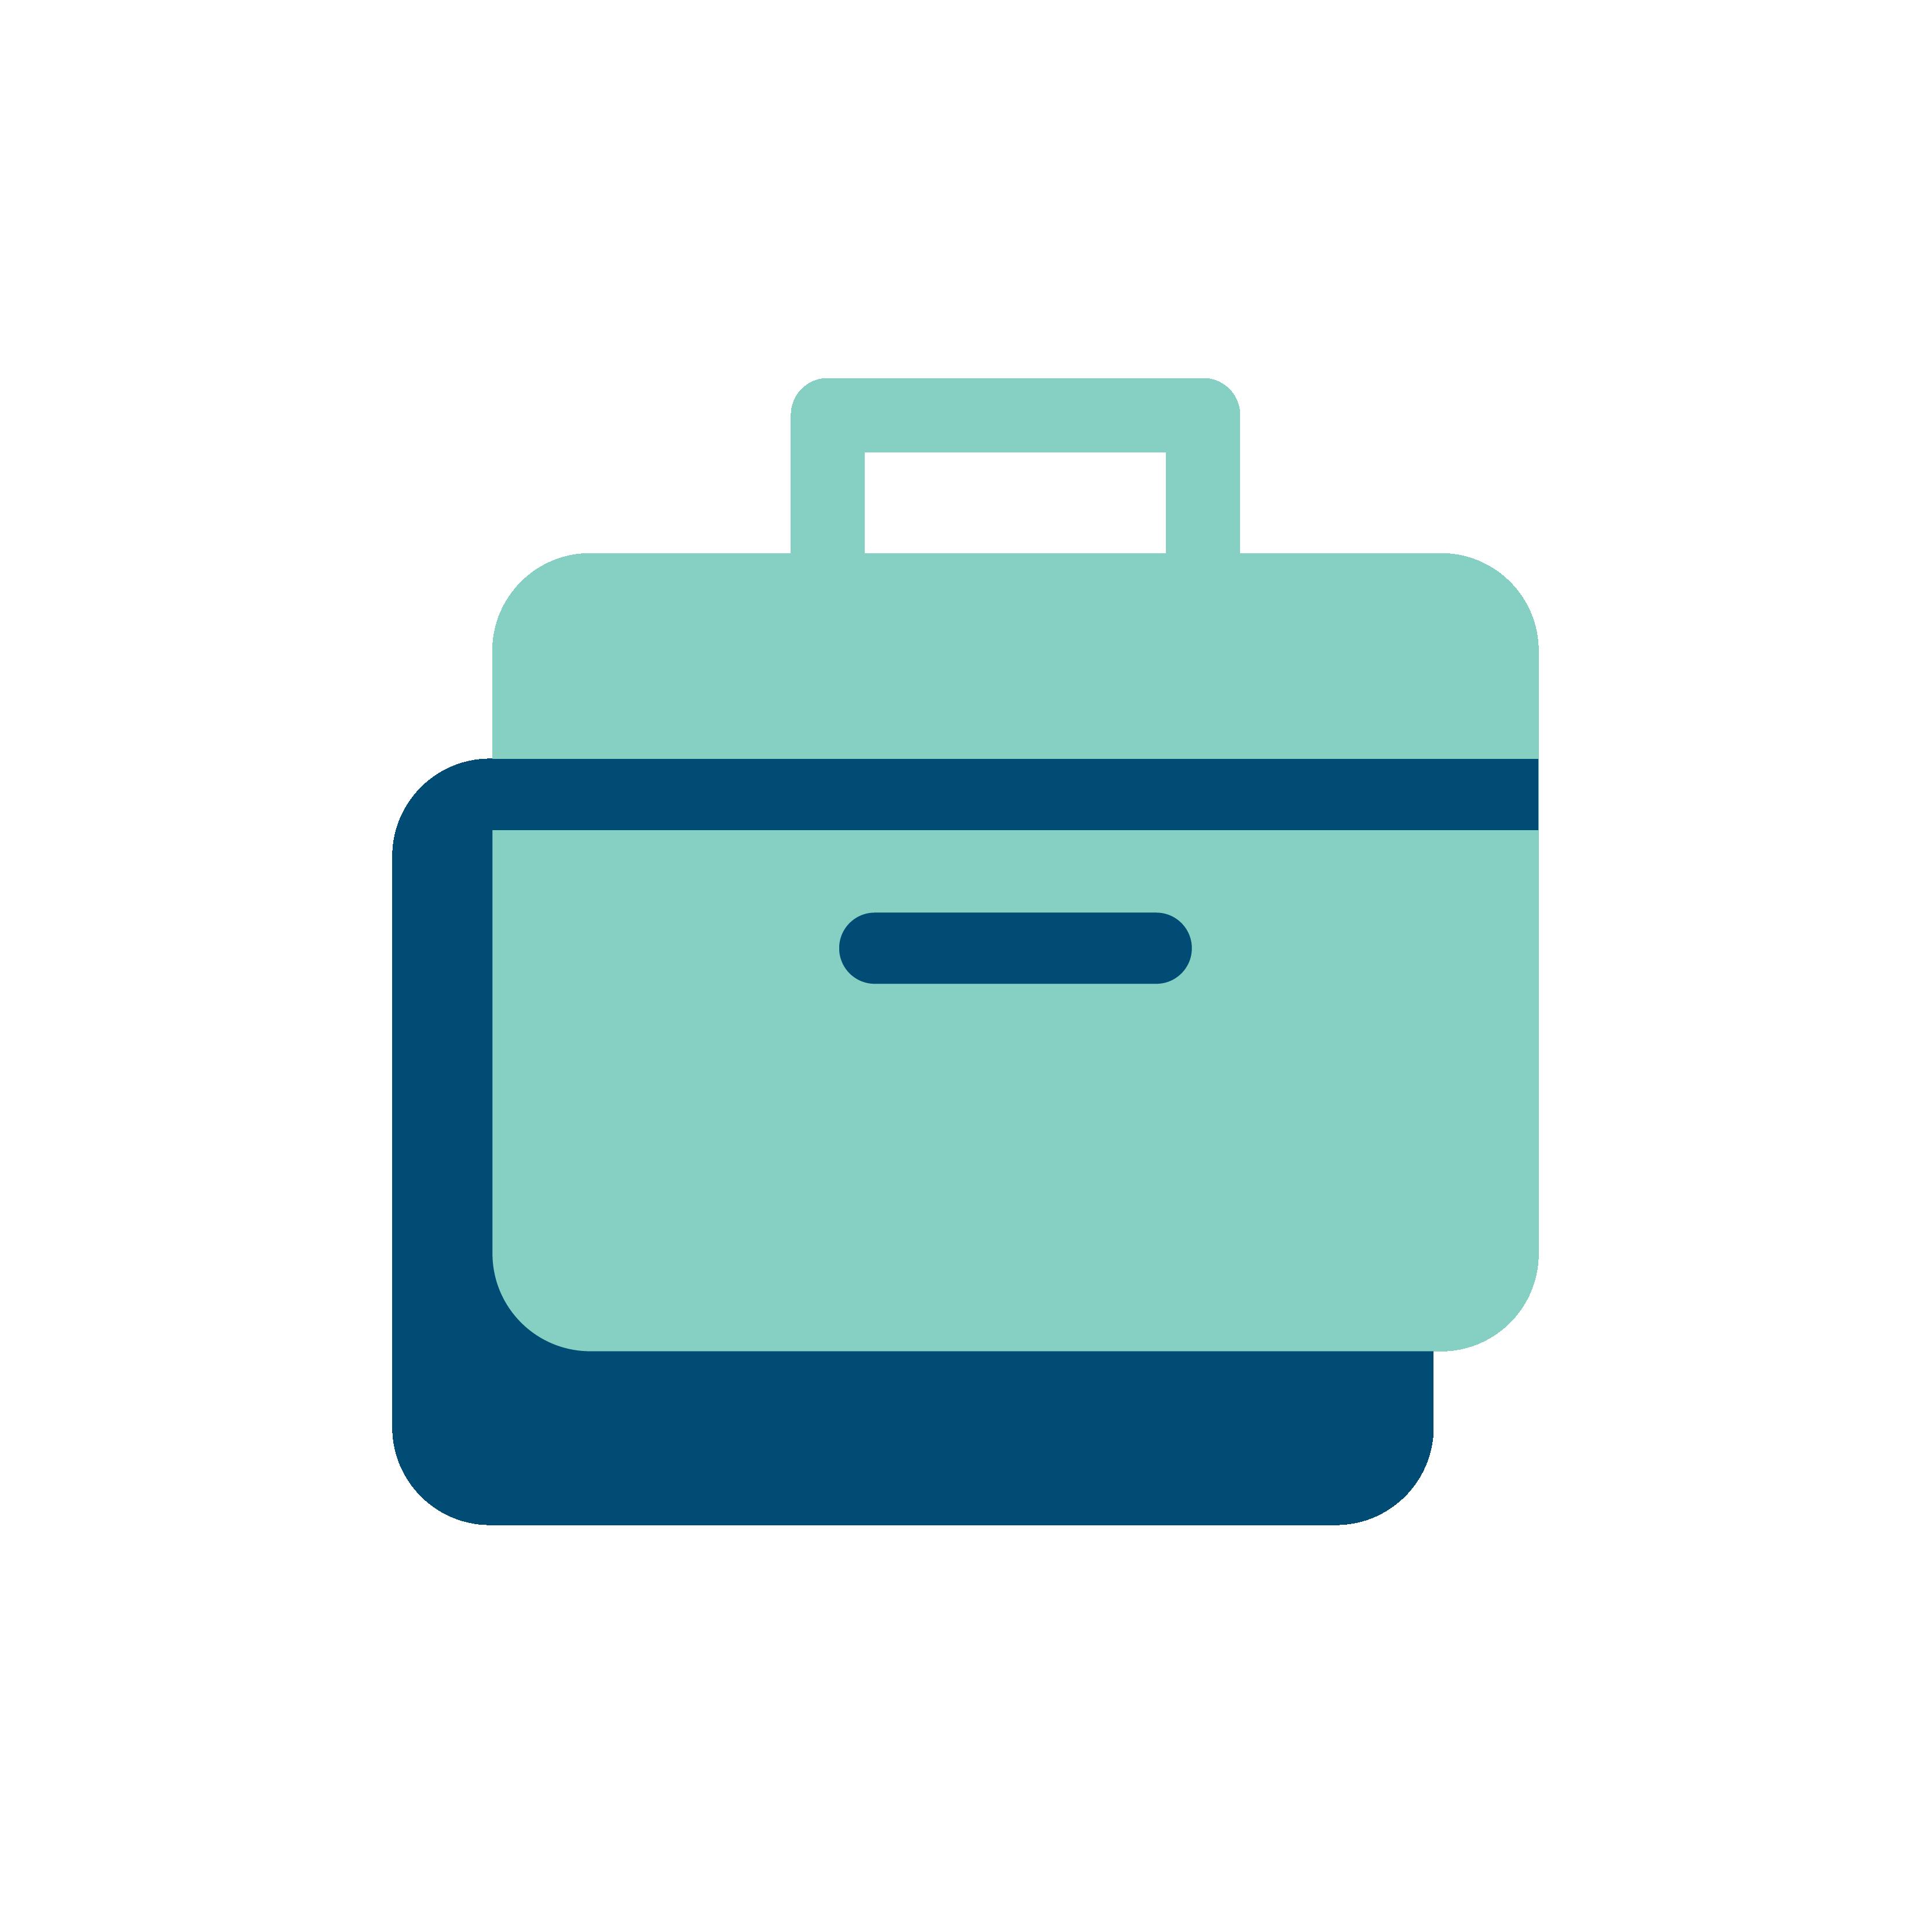 Copy of SB-mint icon AW-RGB-2colour-MATCH